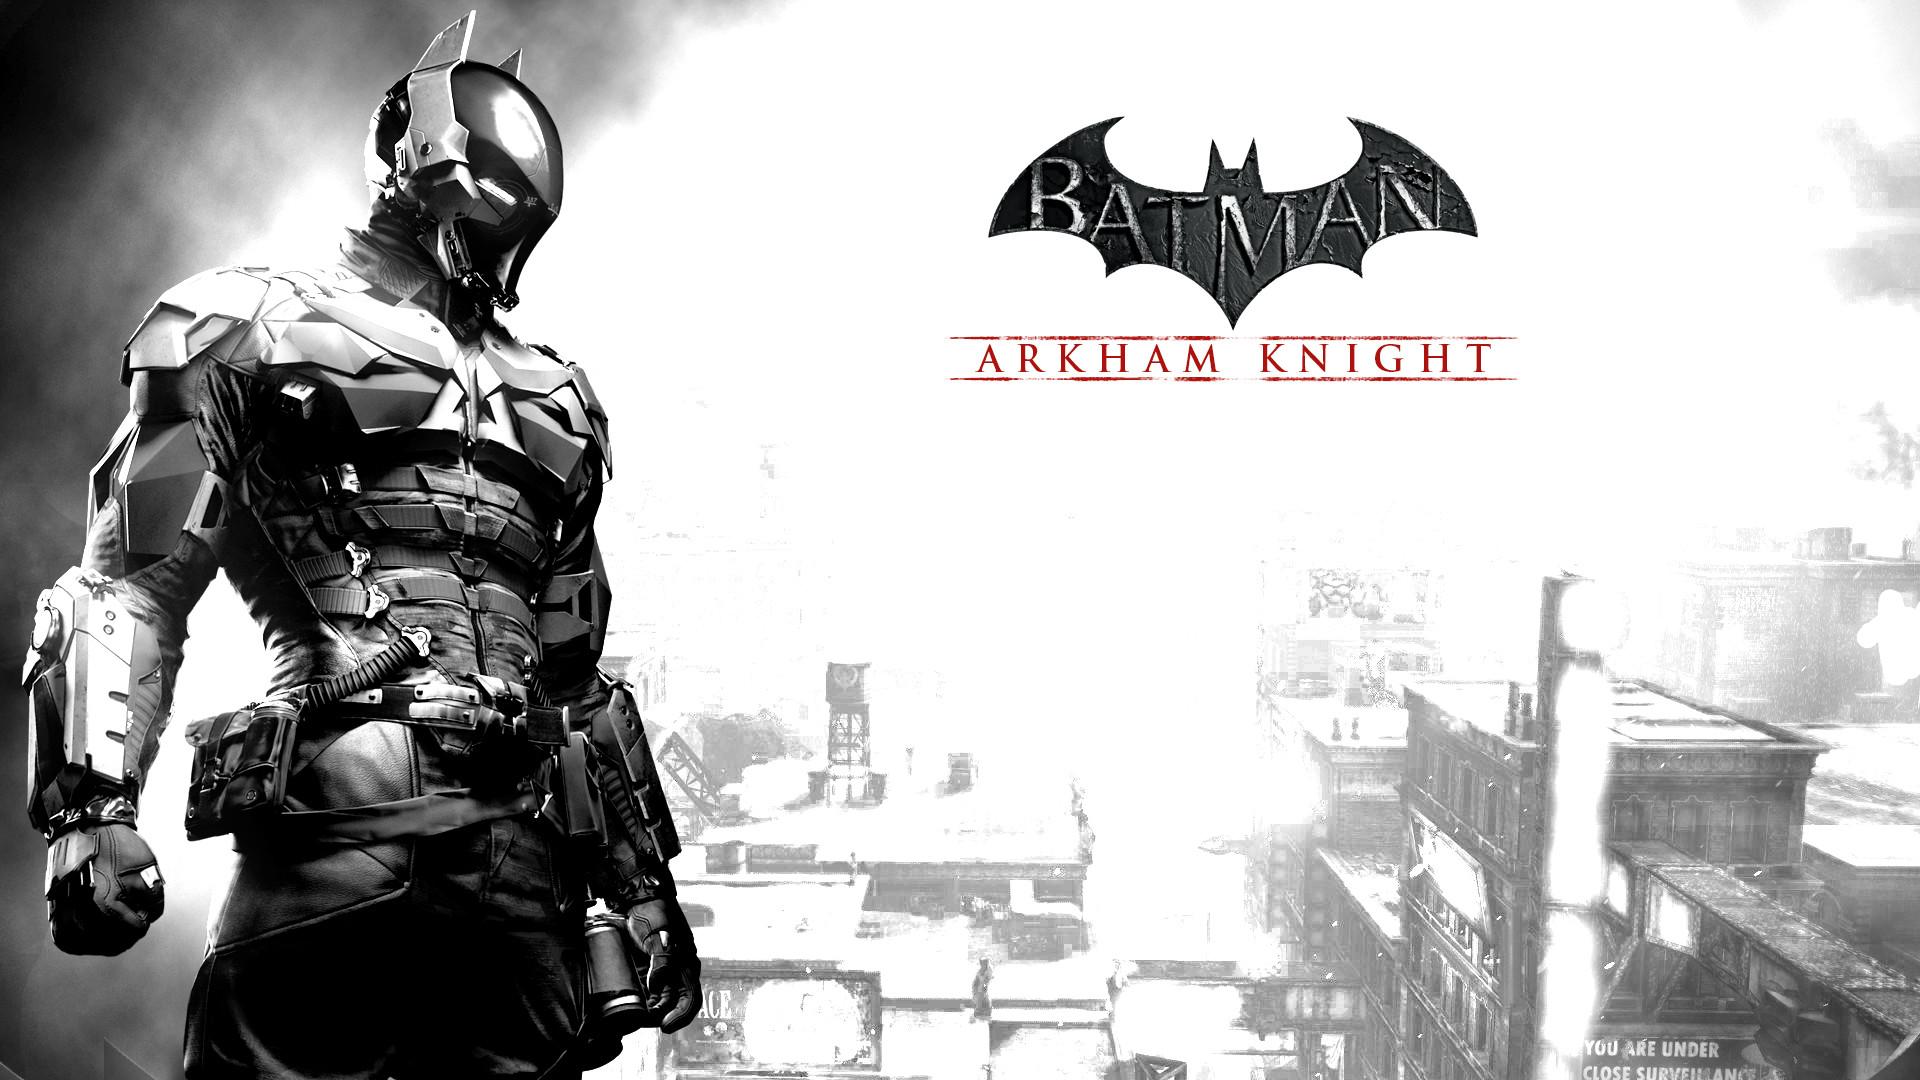 Batman Arkham Knight 2015 Video Game 4k Hd Desktop: Batman Arkham Knight Wallpapers High Quality